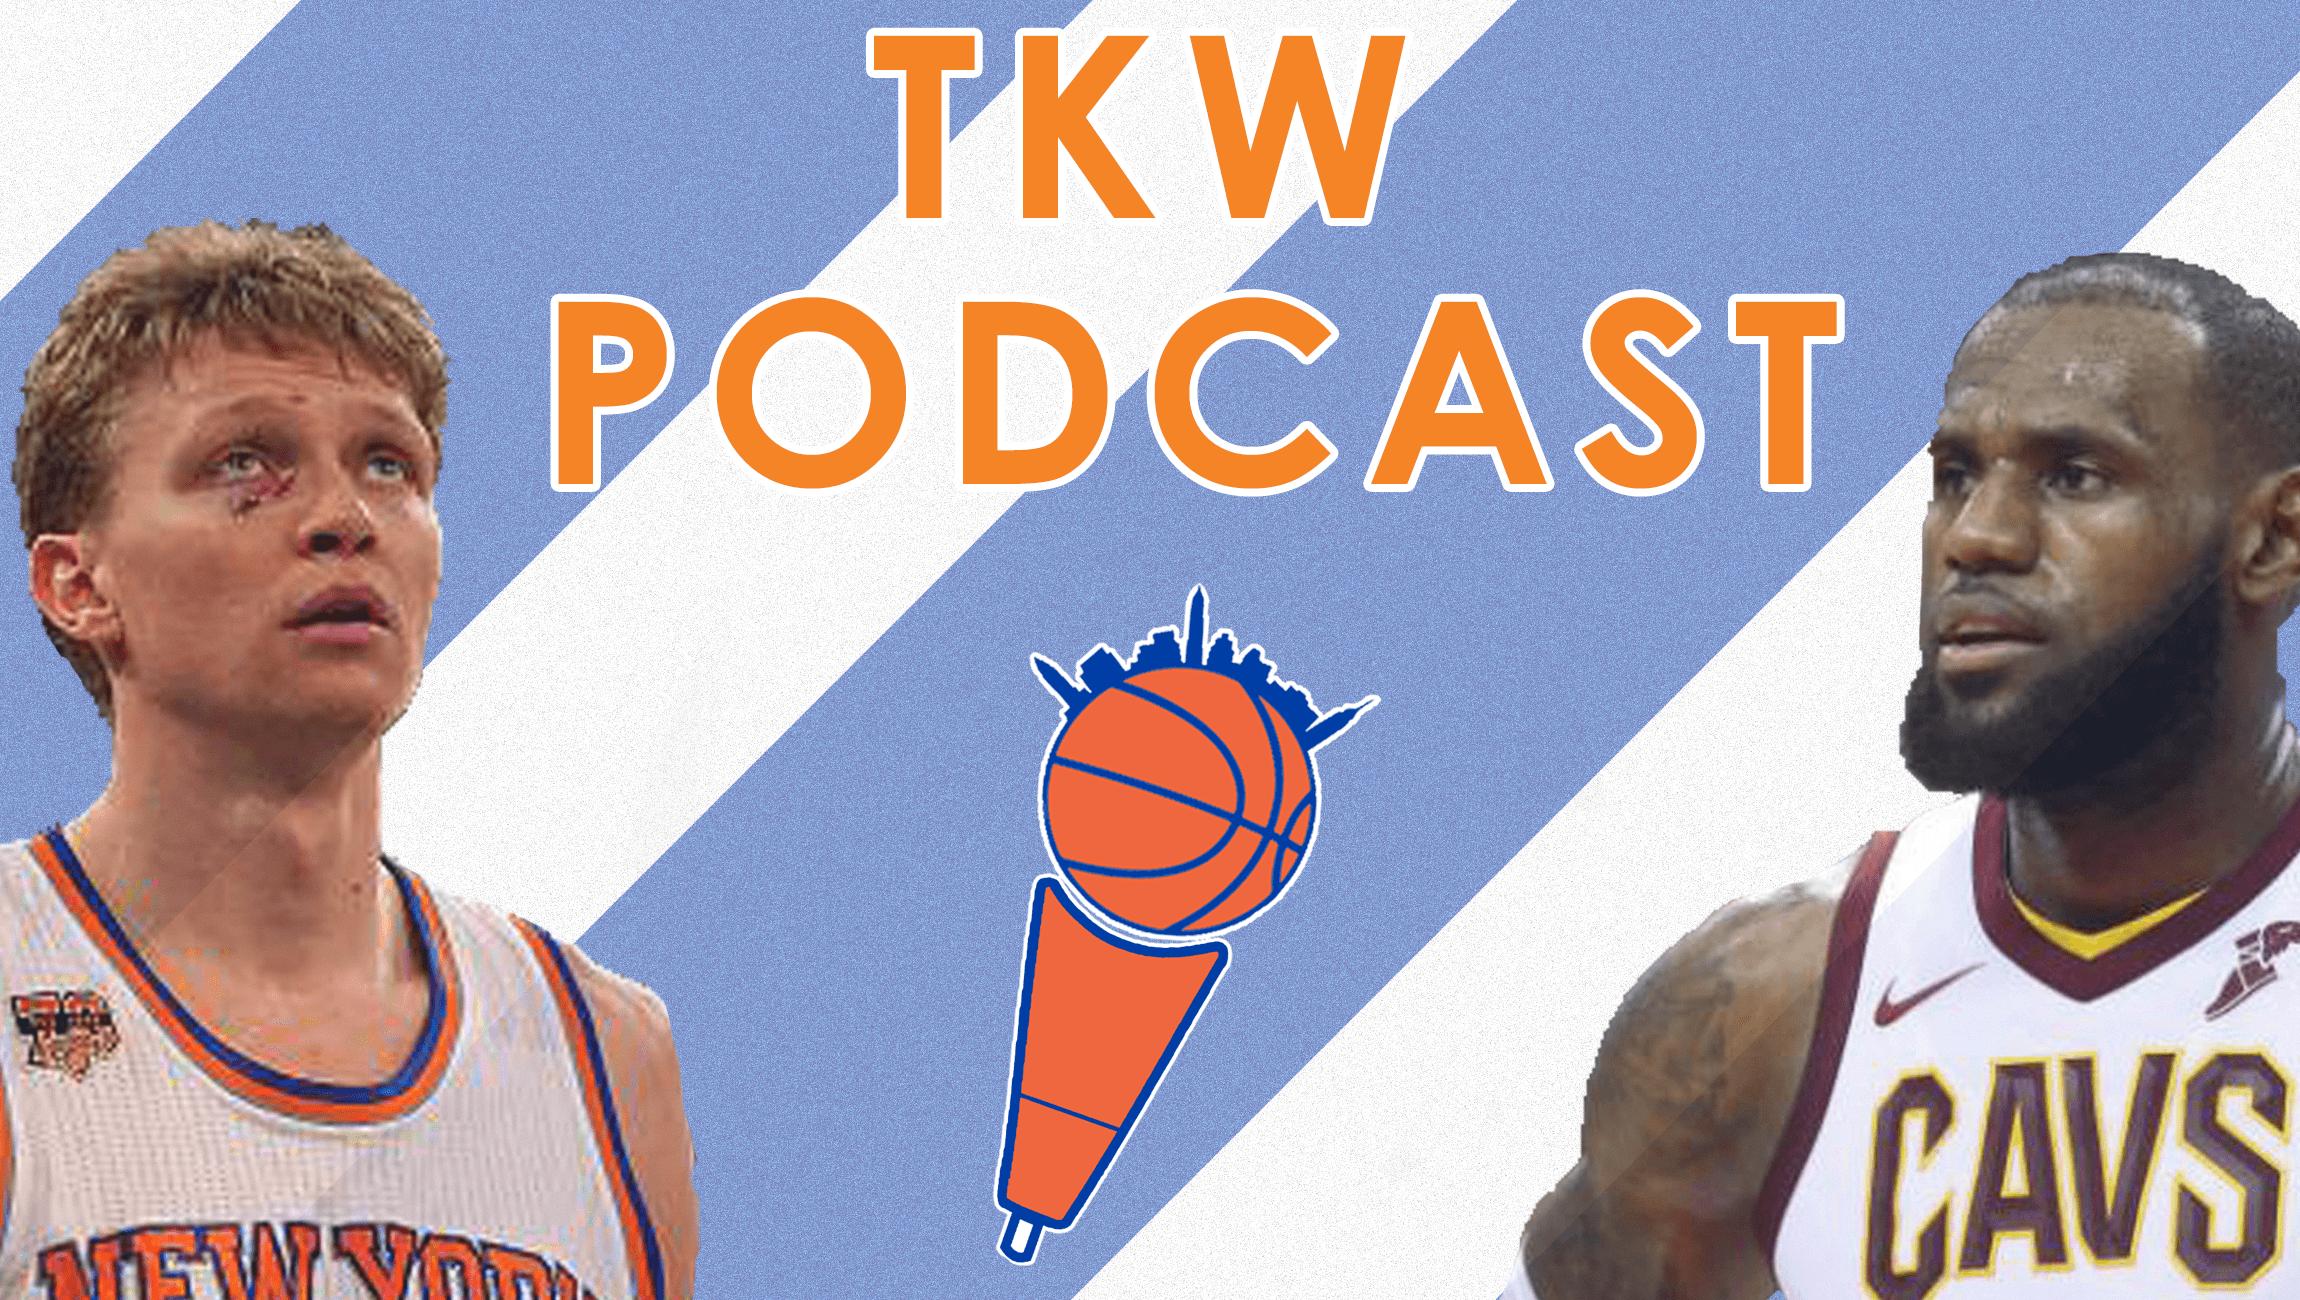 LeBron/DSJ, Kuz, Noah's Return, KP's Killin' It | TKW Podcast